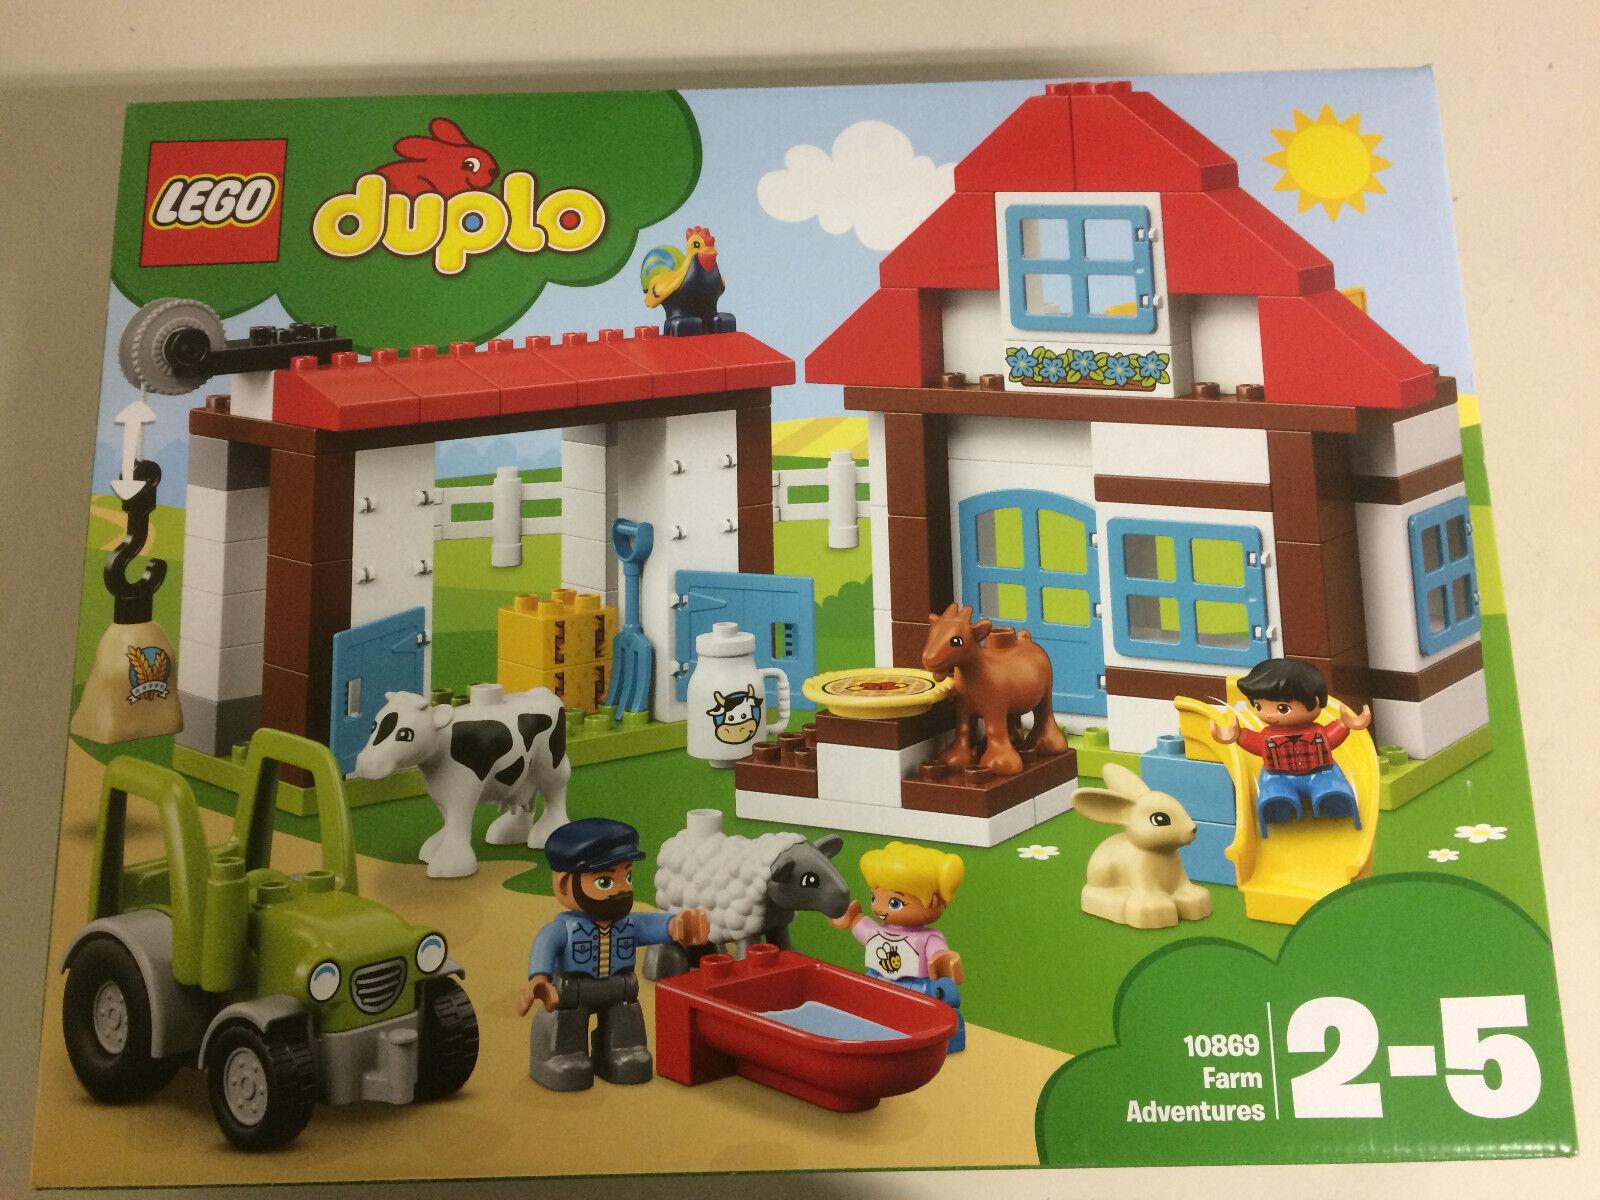 LEGO DUPLO 10869 FARM ADVENTURES - VISITIAMO  LA FATTORIA Nuovo nouveau sealed  connotation de luxe discret